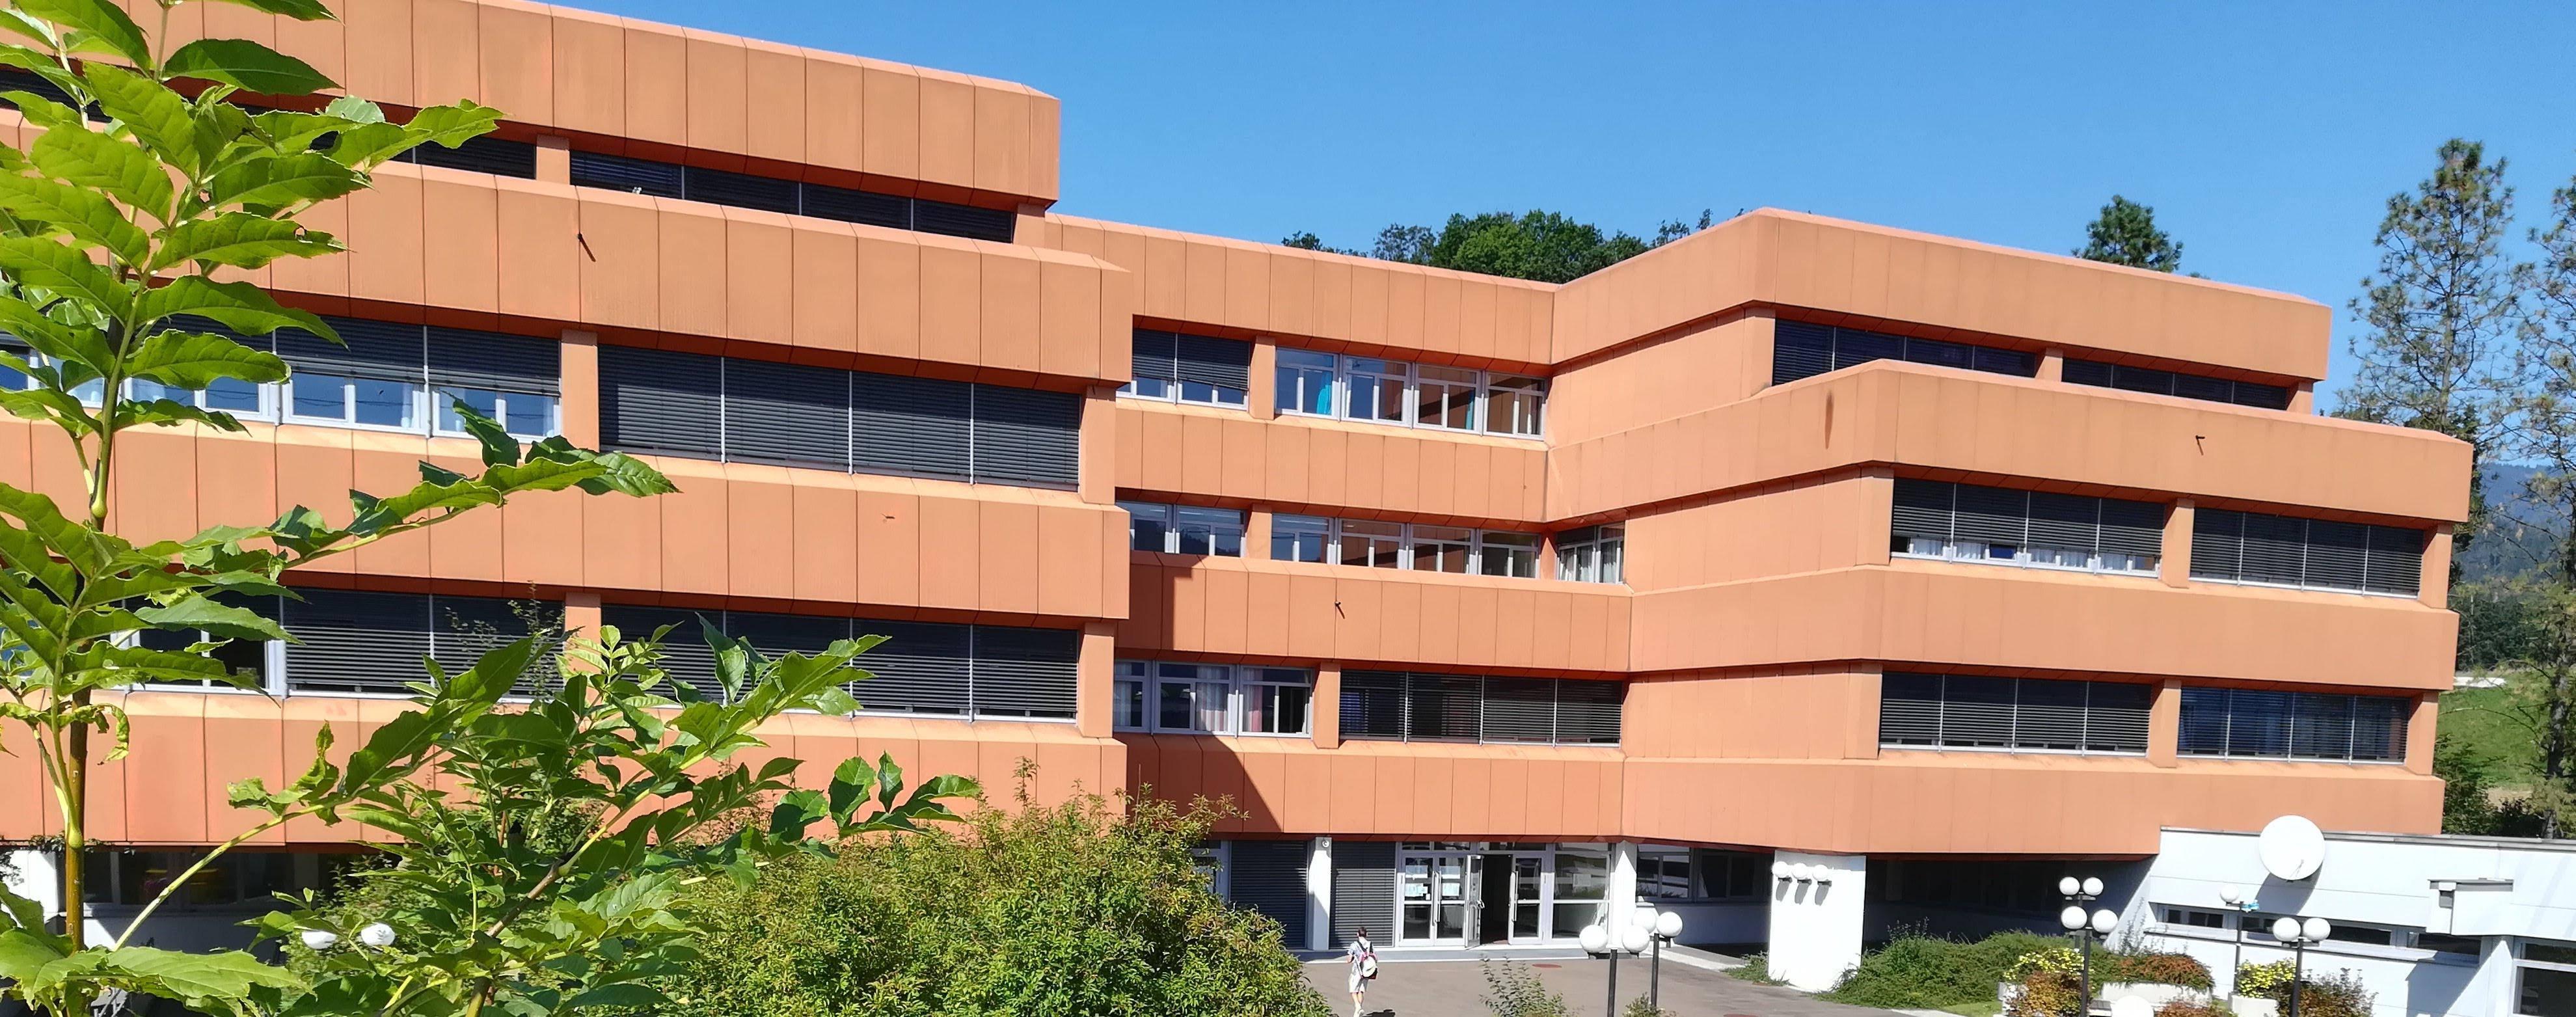 Homepage des Gymnasiums Kapfenberg